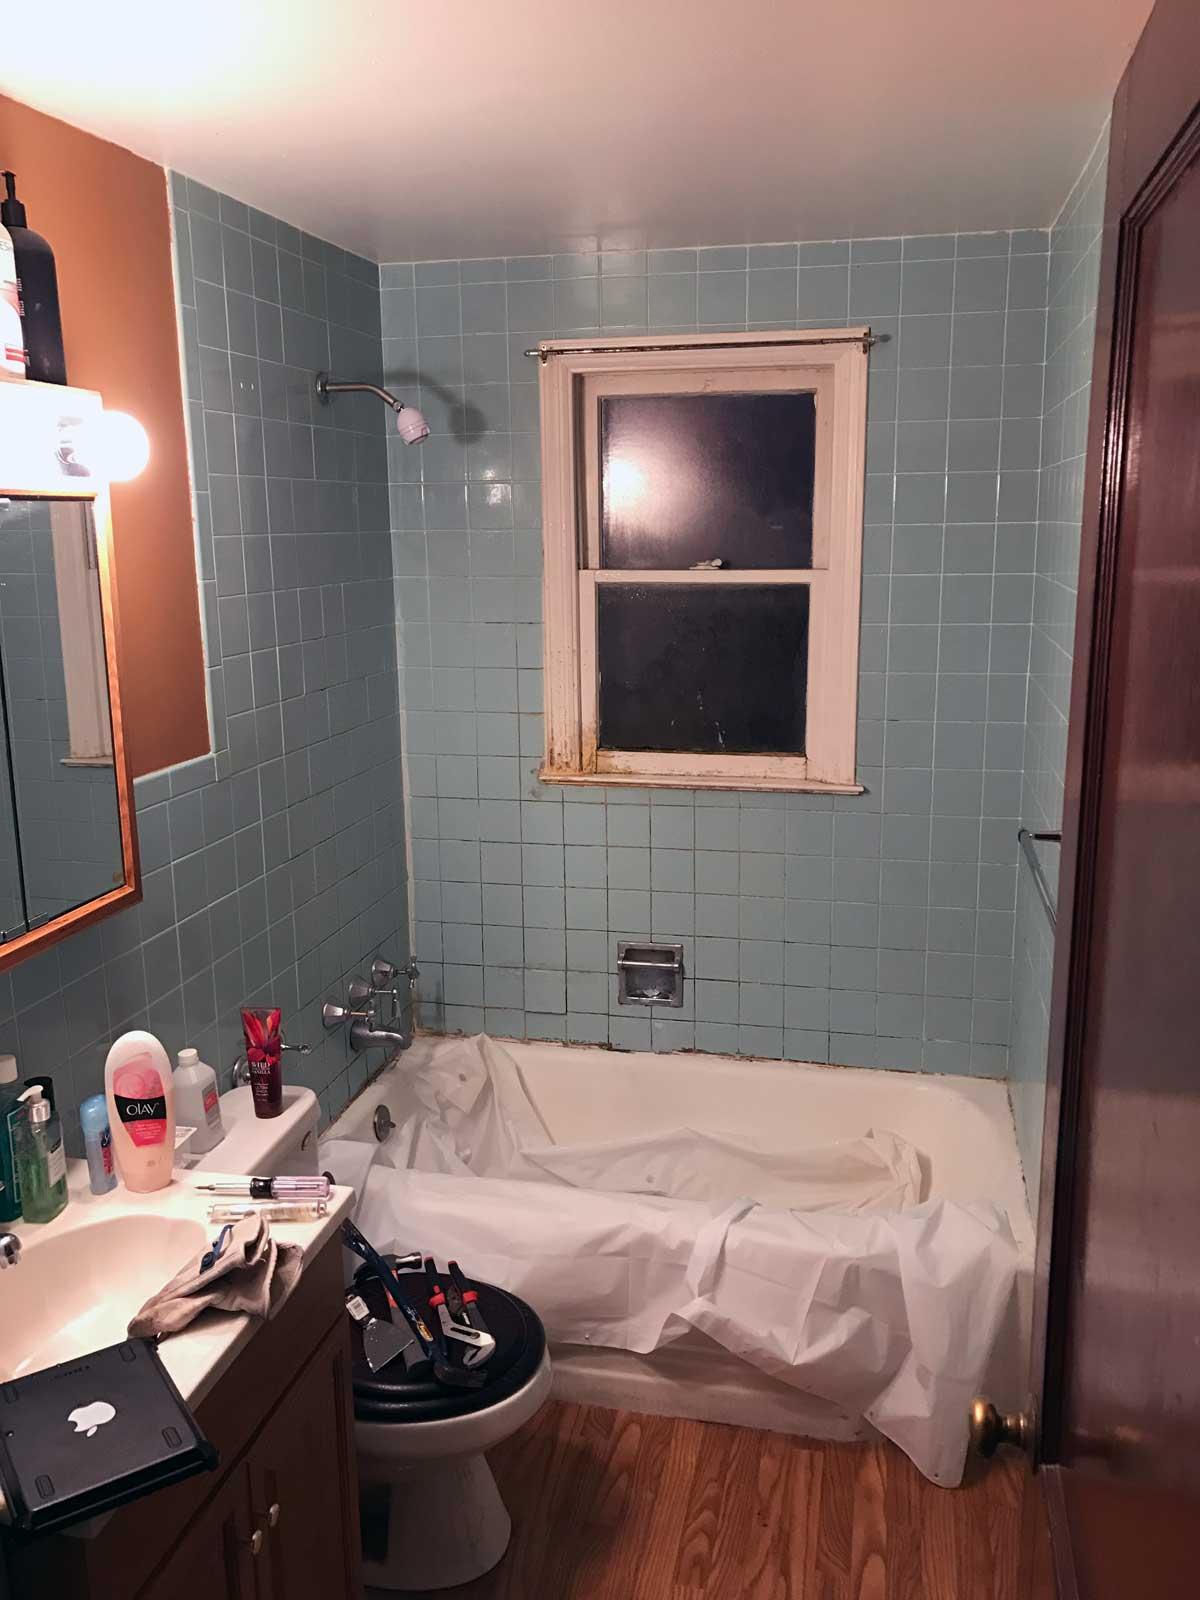 15-Day-Bathroom-Renovation-02.jpg